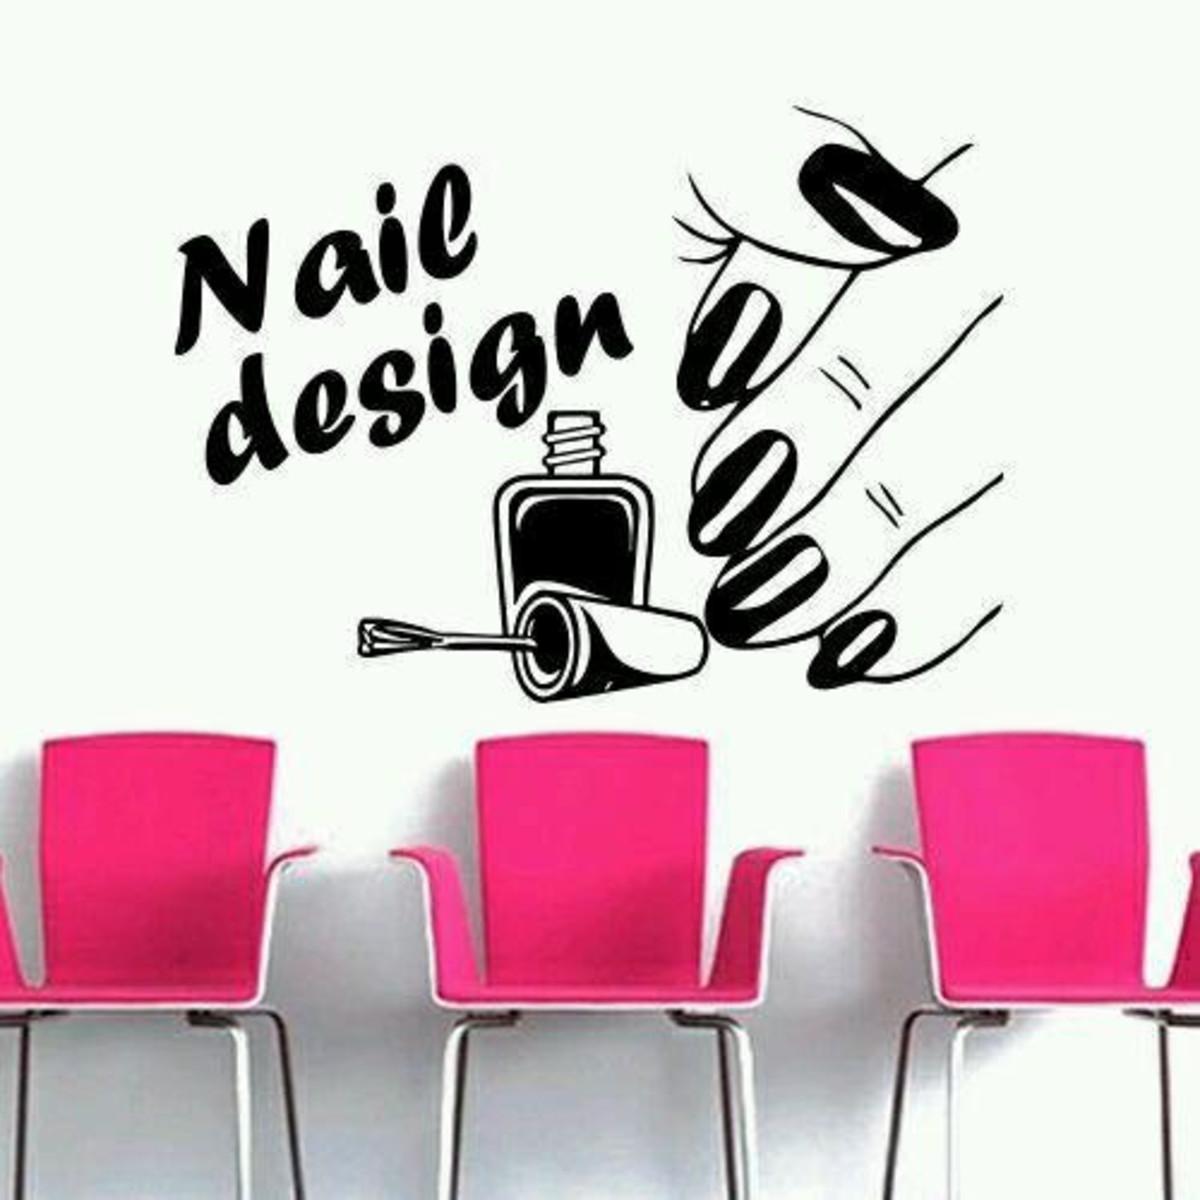 Adesivo Decorativo Manicure Nail Design no Elo7   Toca do ...